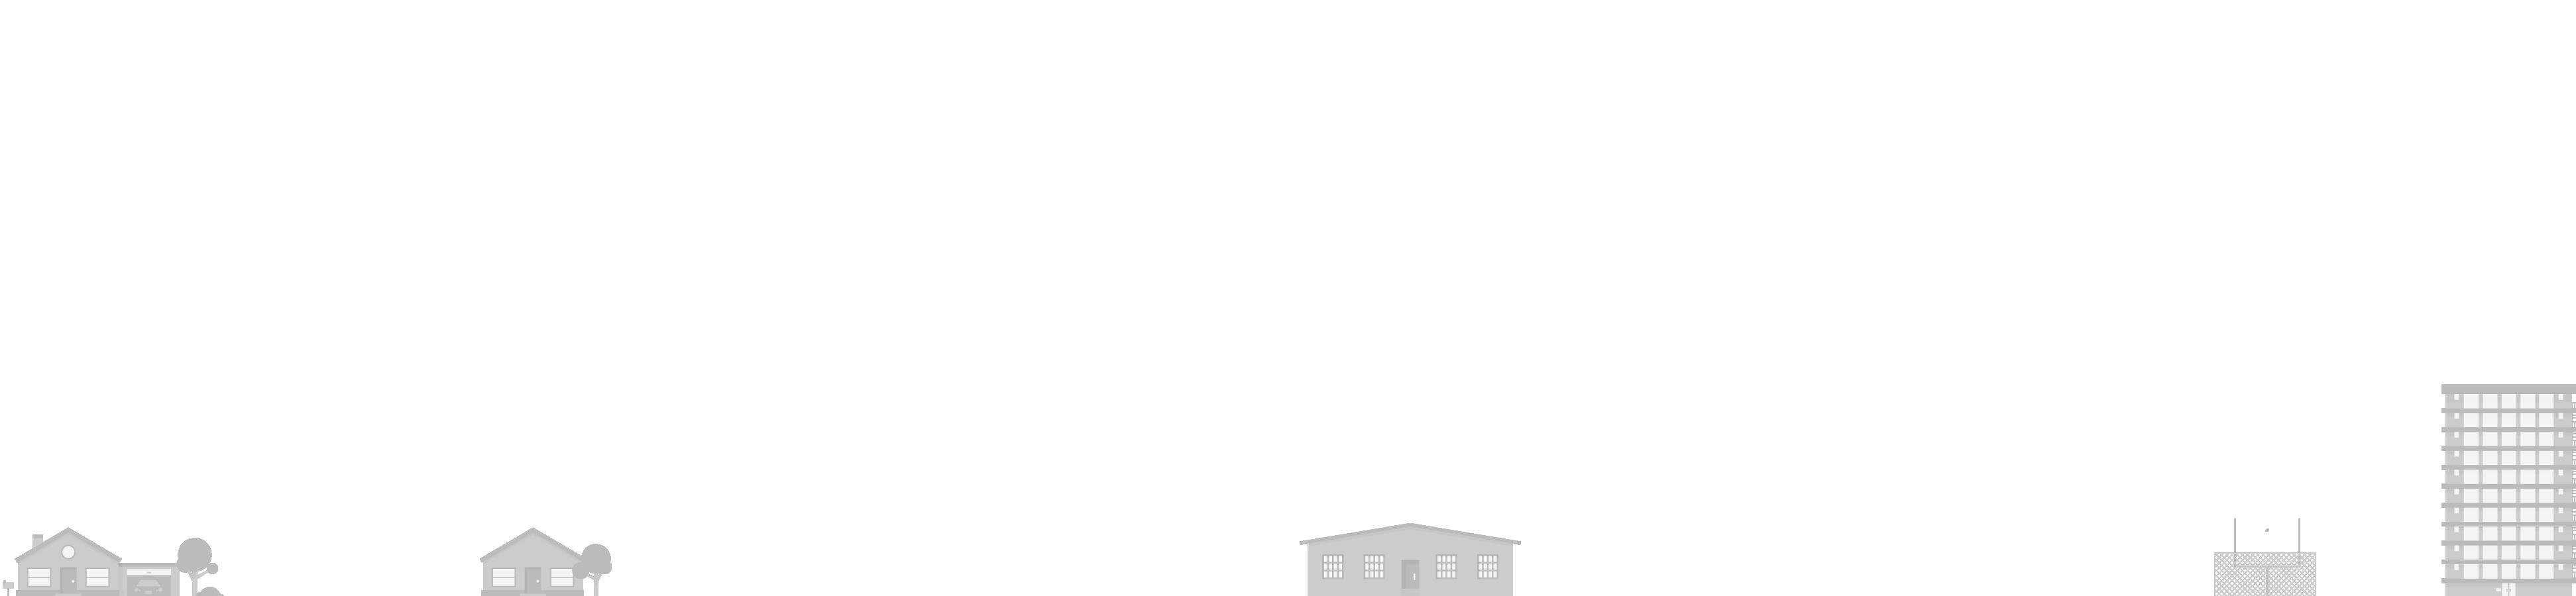 background layer midground layer